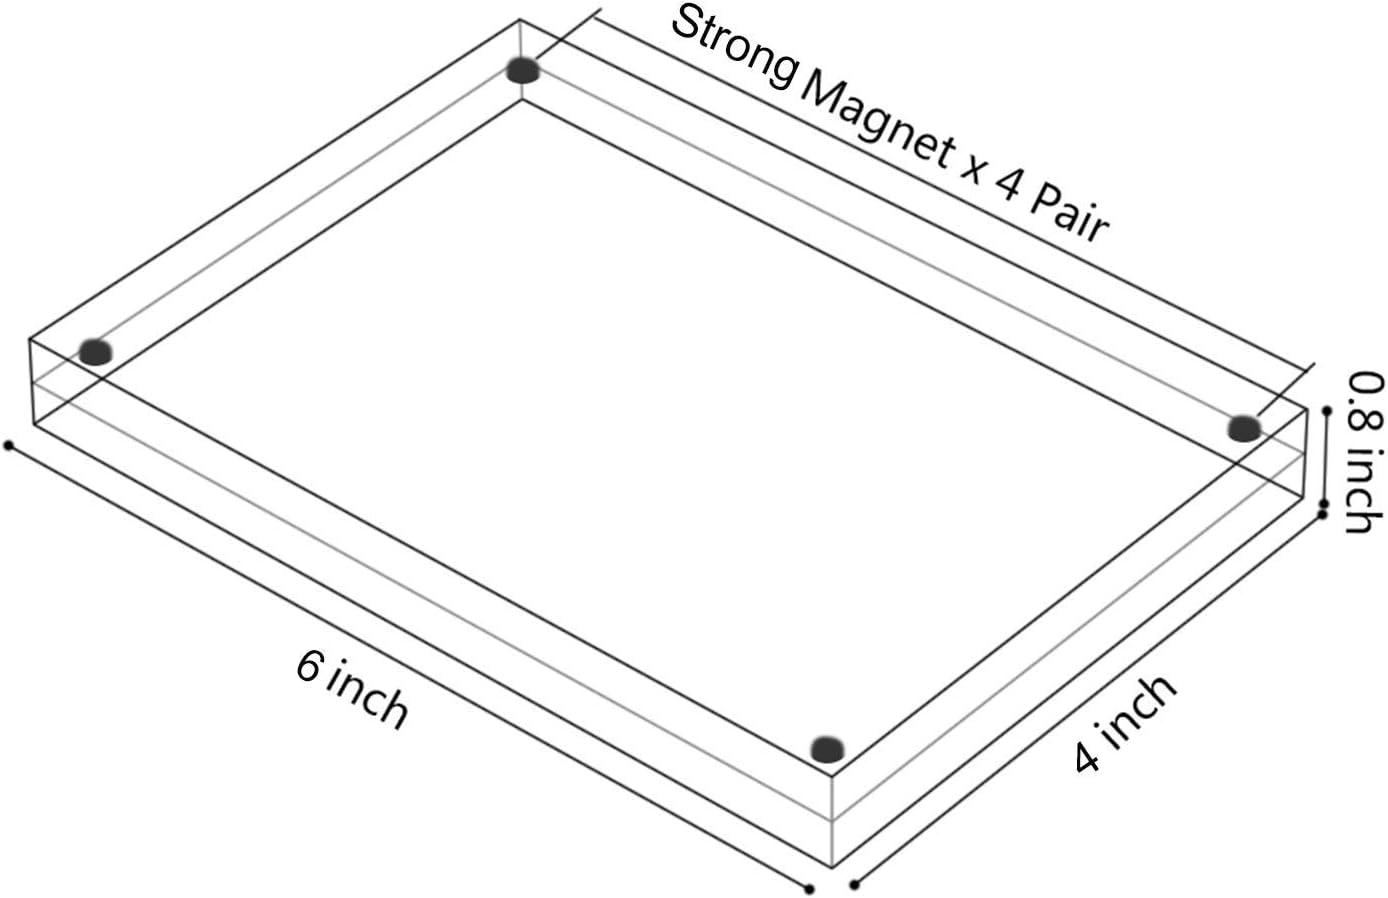 Acrilico Cornice Immagini Contiene 9/x 13/cm Immagini,10/+ 10/mm Spessore Frameless Desktop Cartolina Display/ /Trasparente AMEITECH Cornice Magnetica